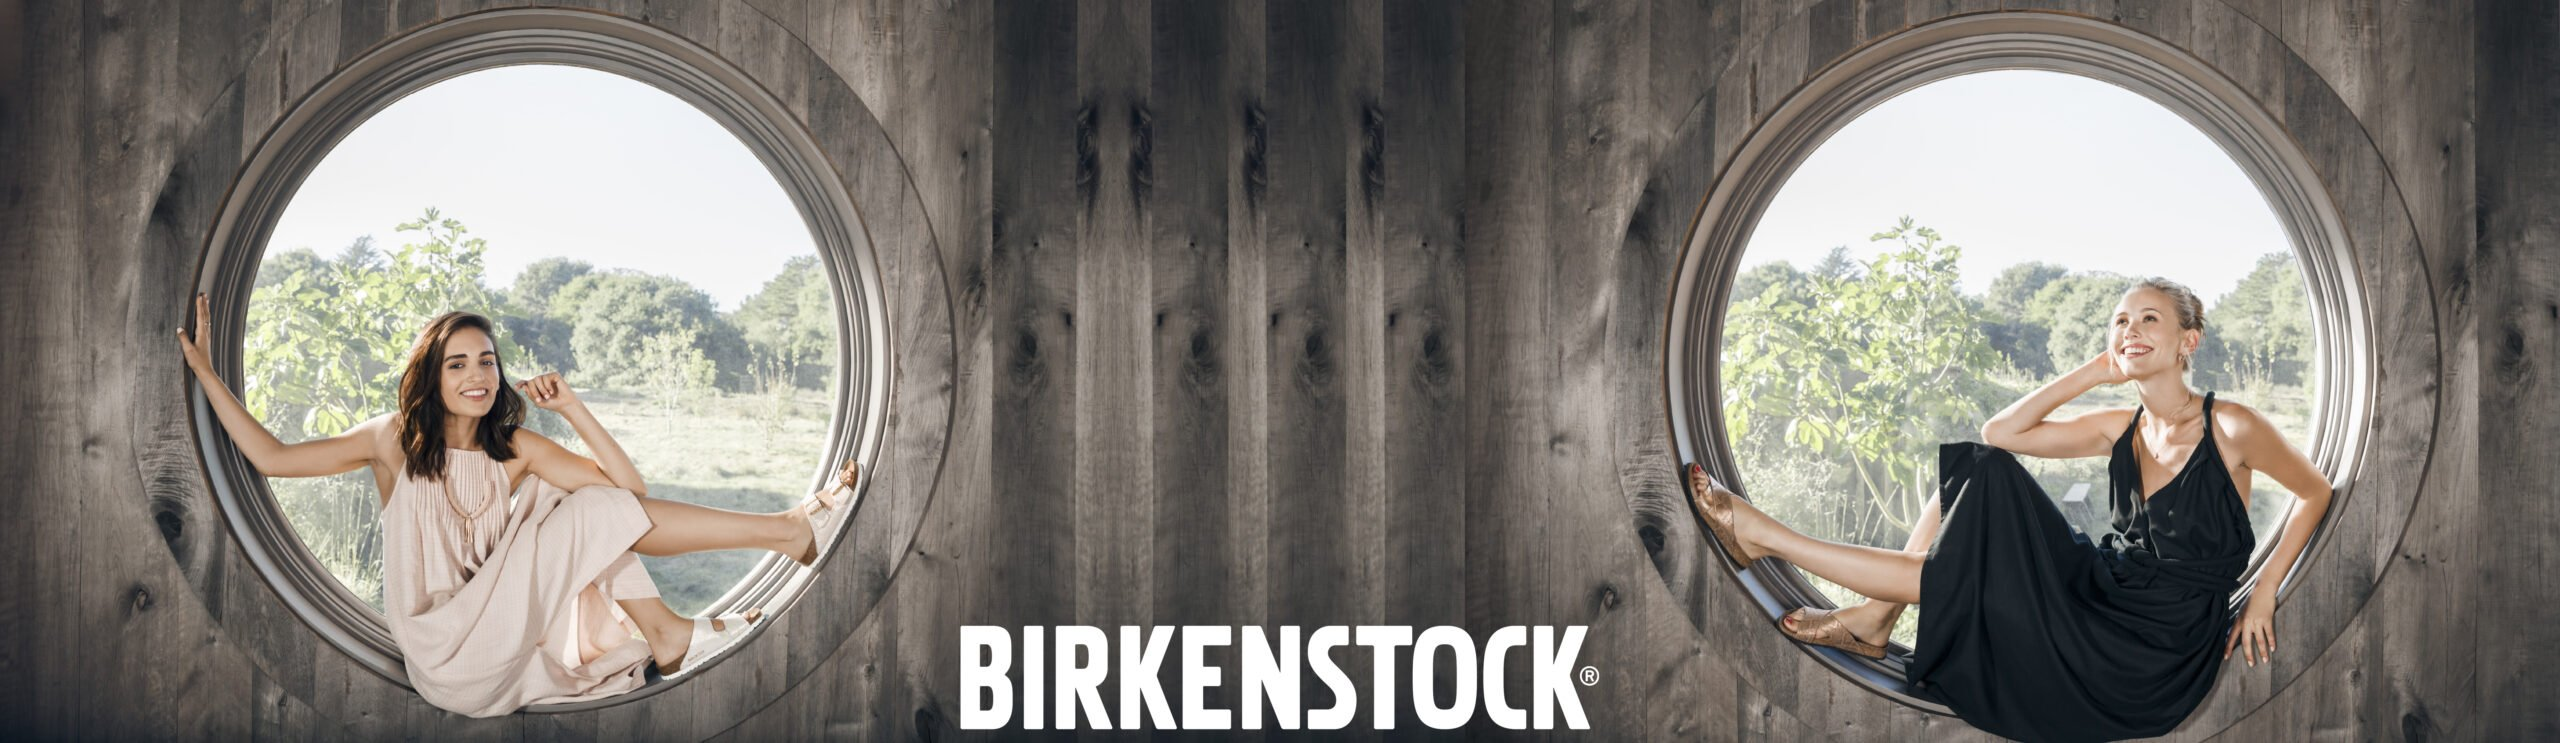 Birkenstock at Morgan's Shoes